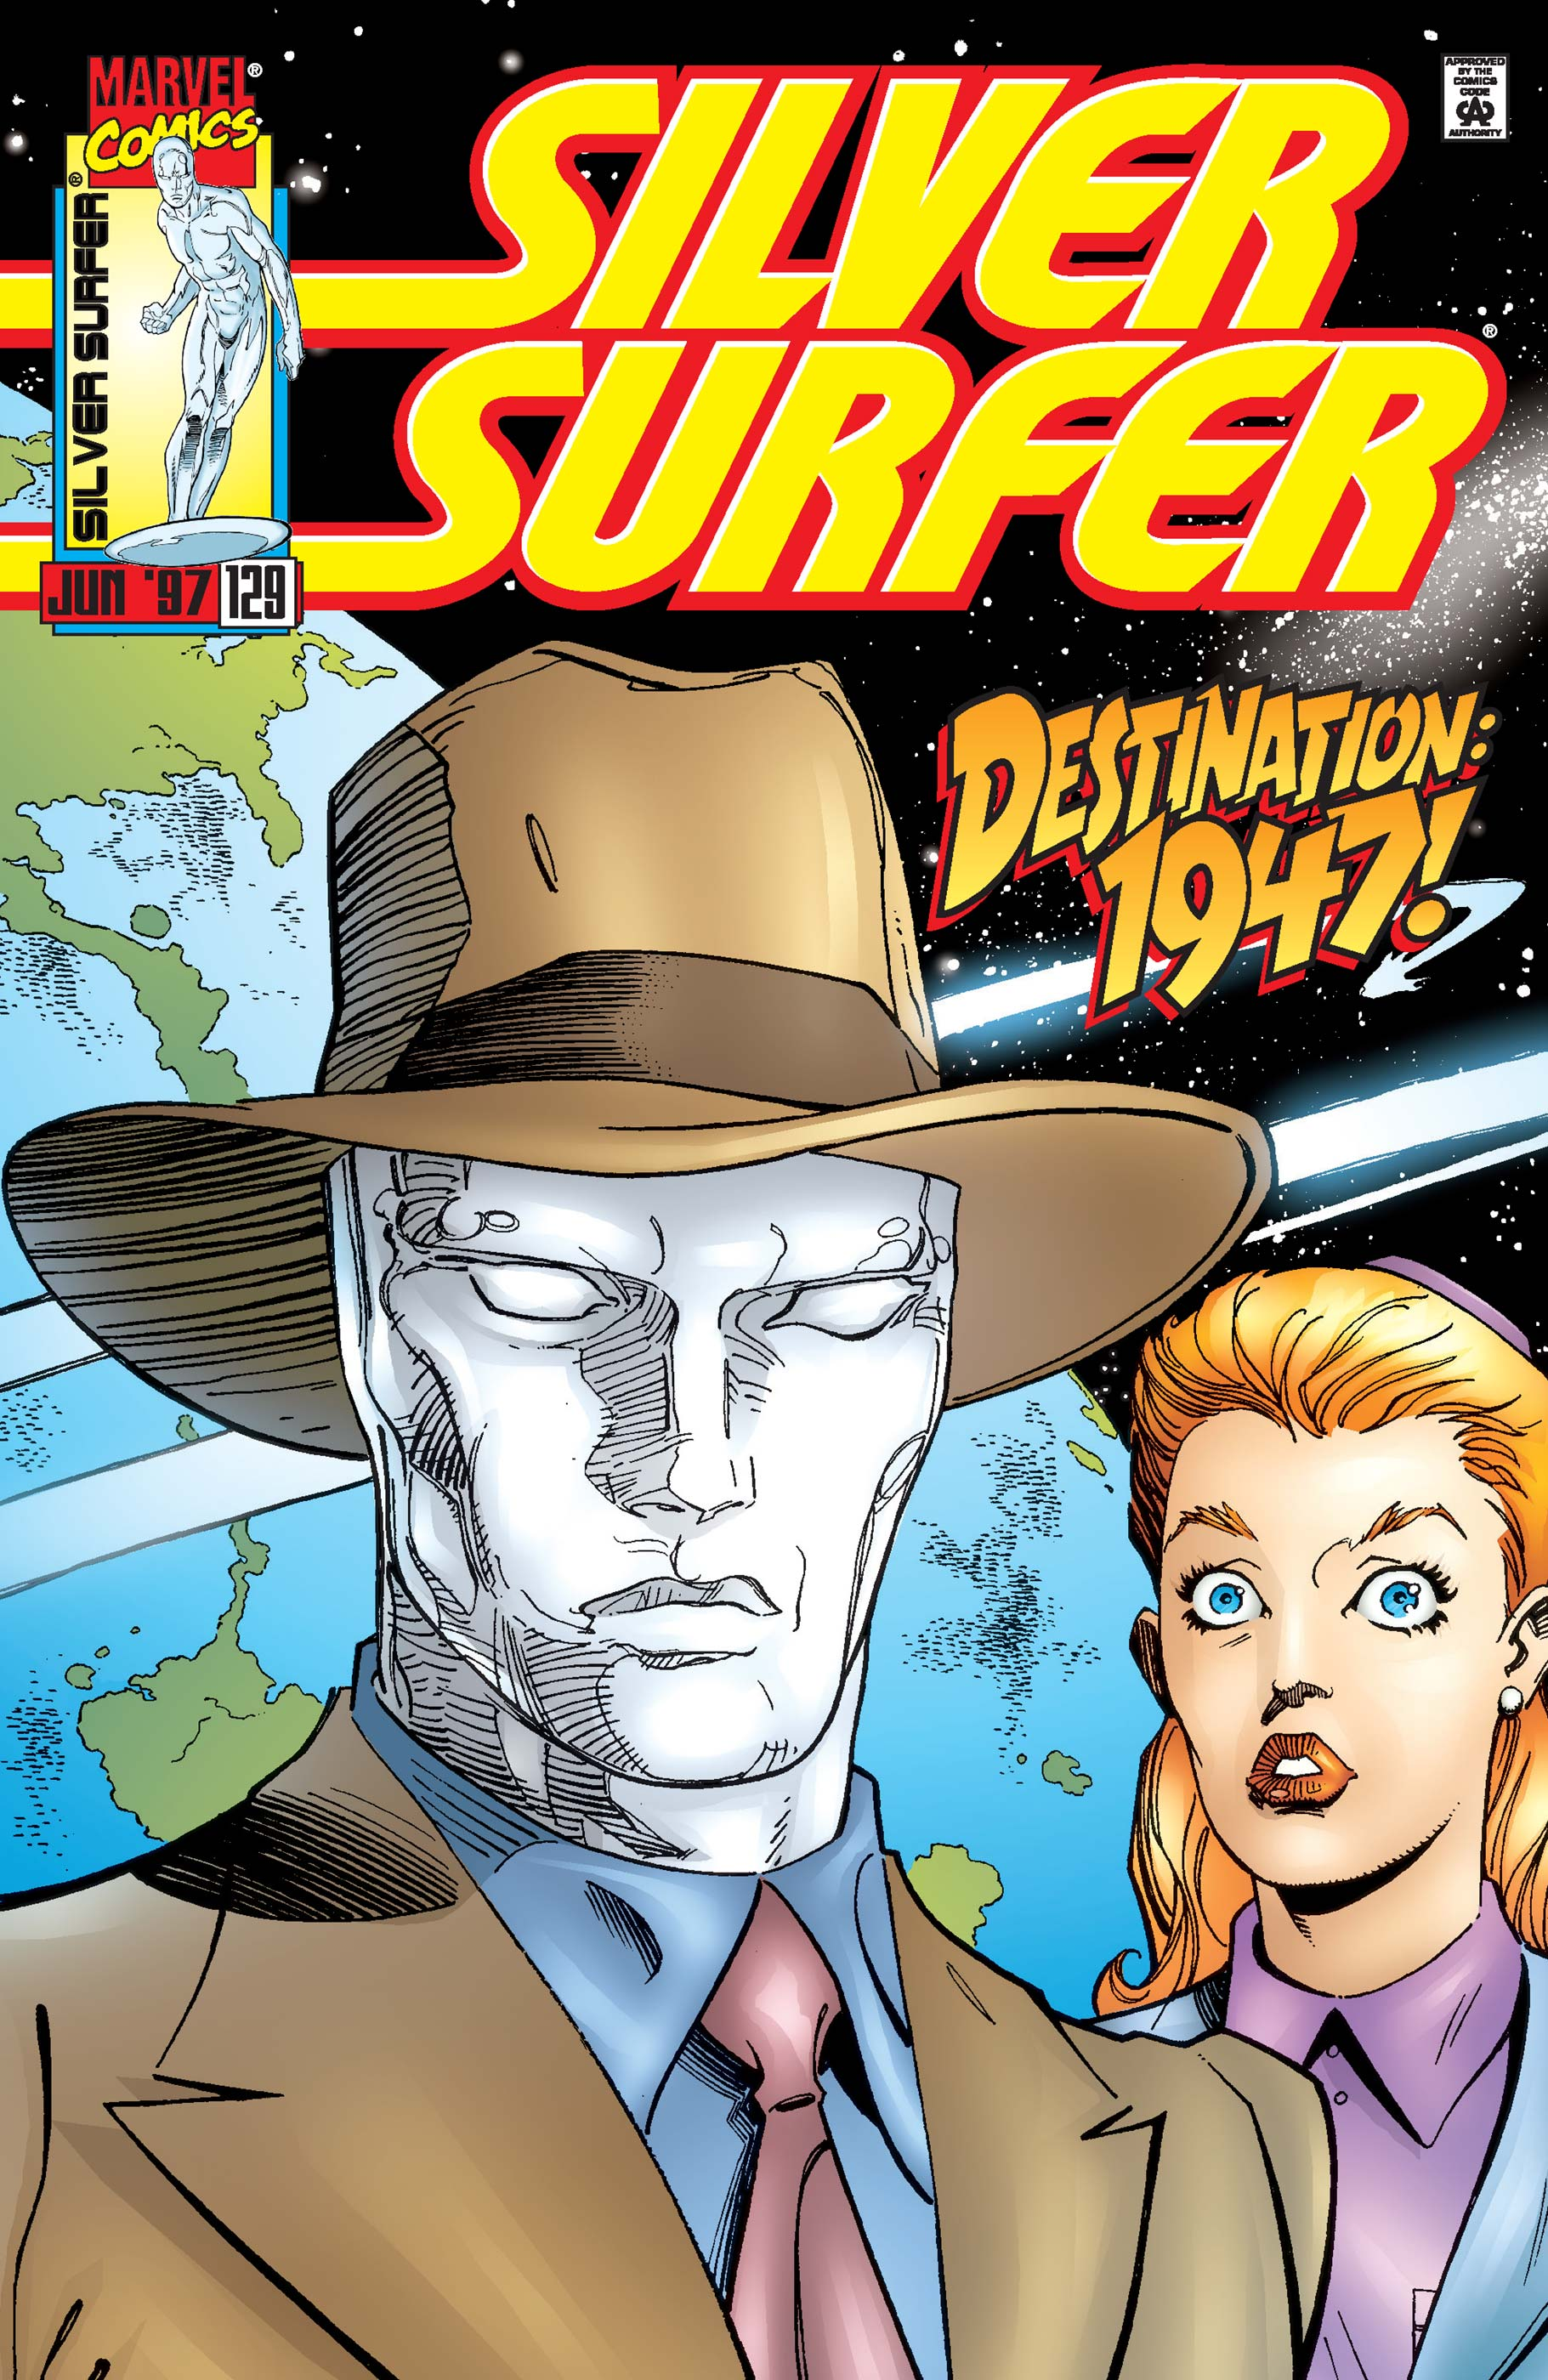 Silver Surfer (1987) #129